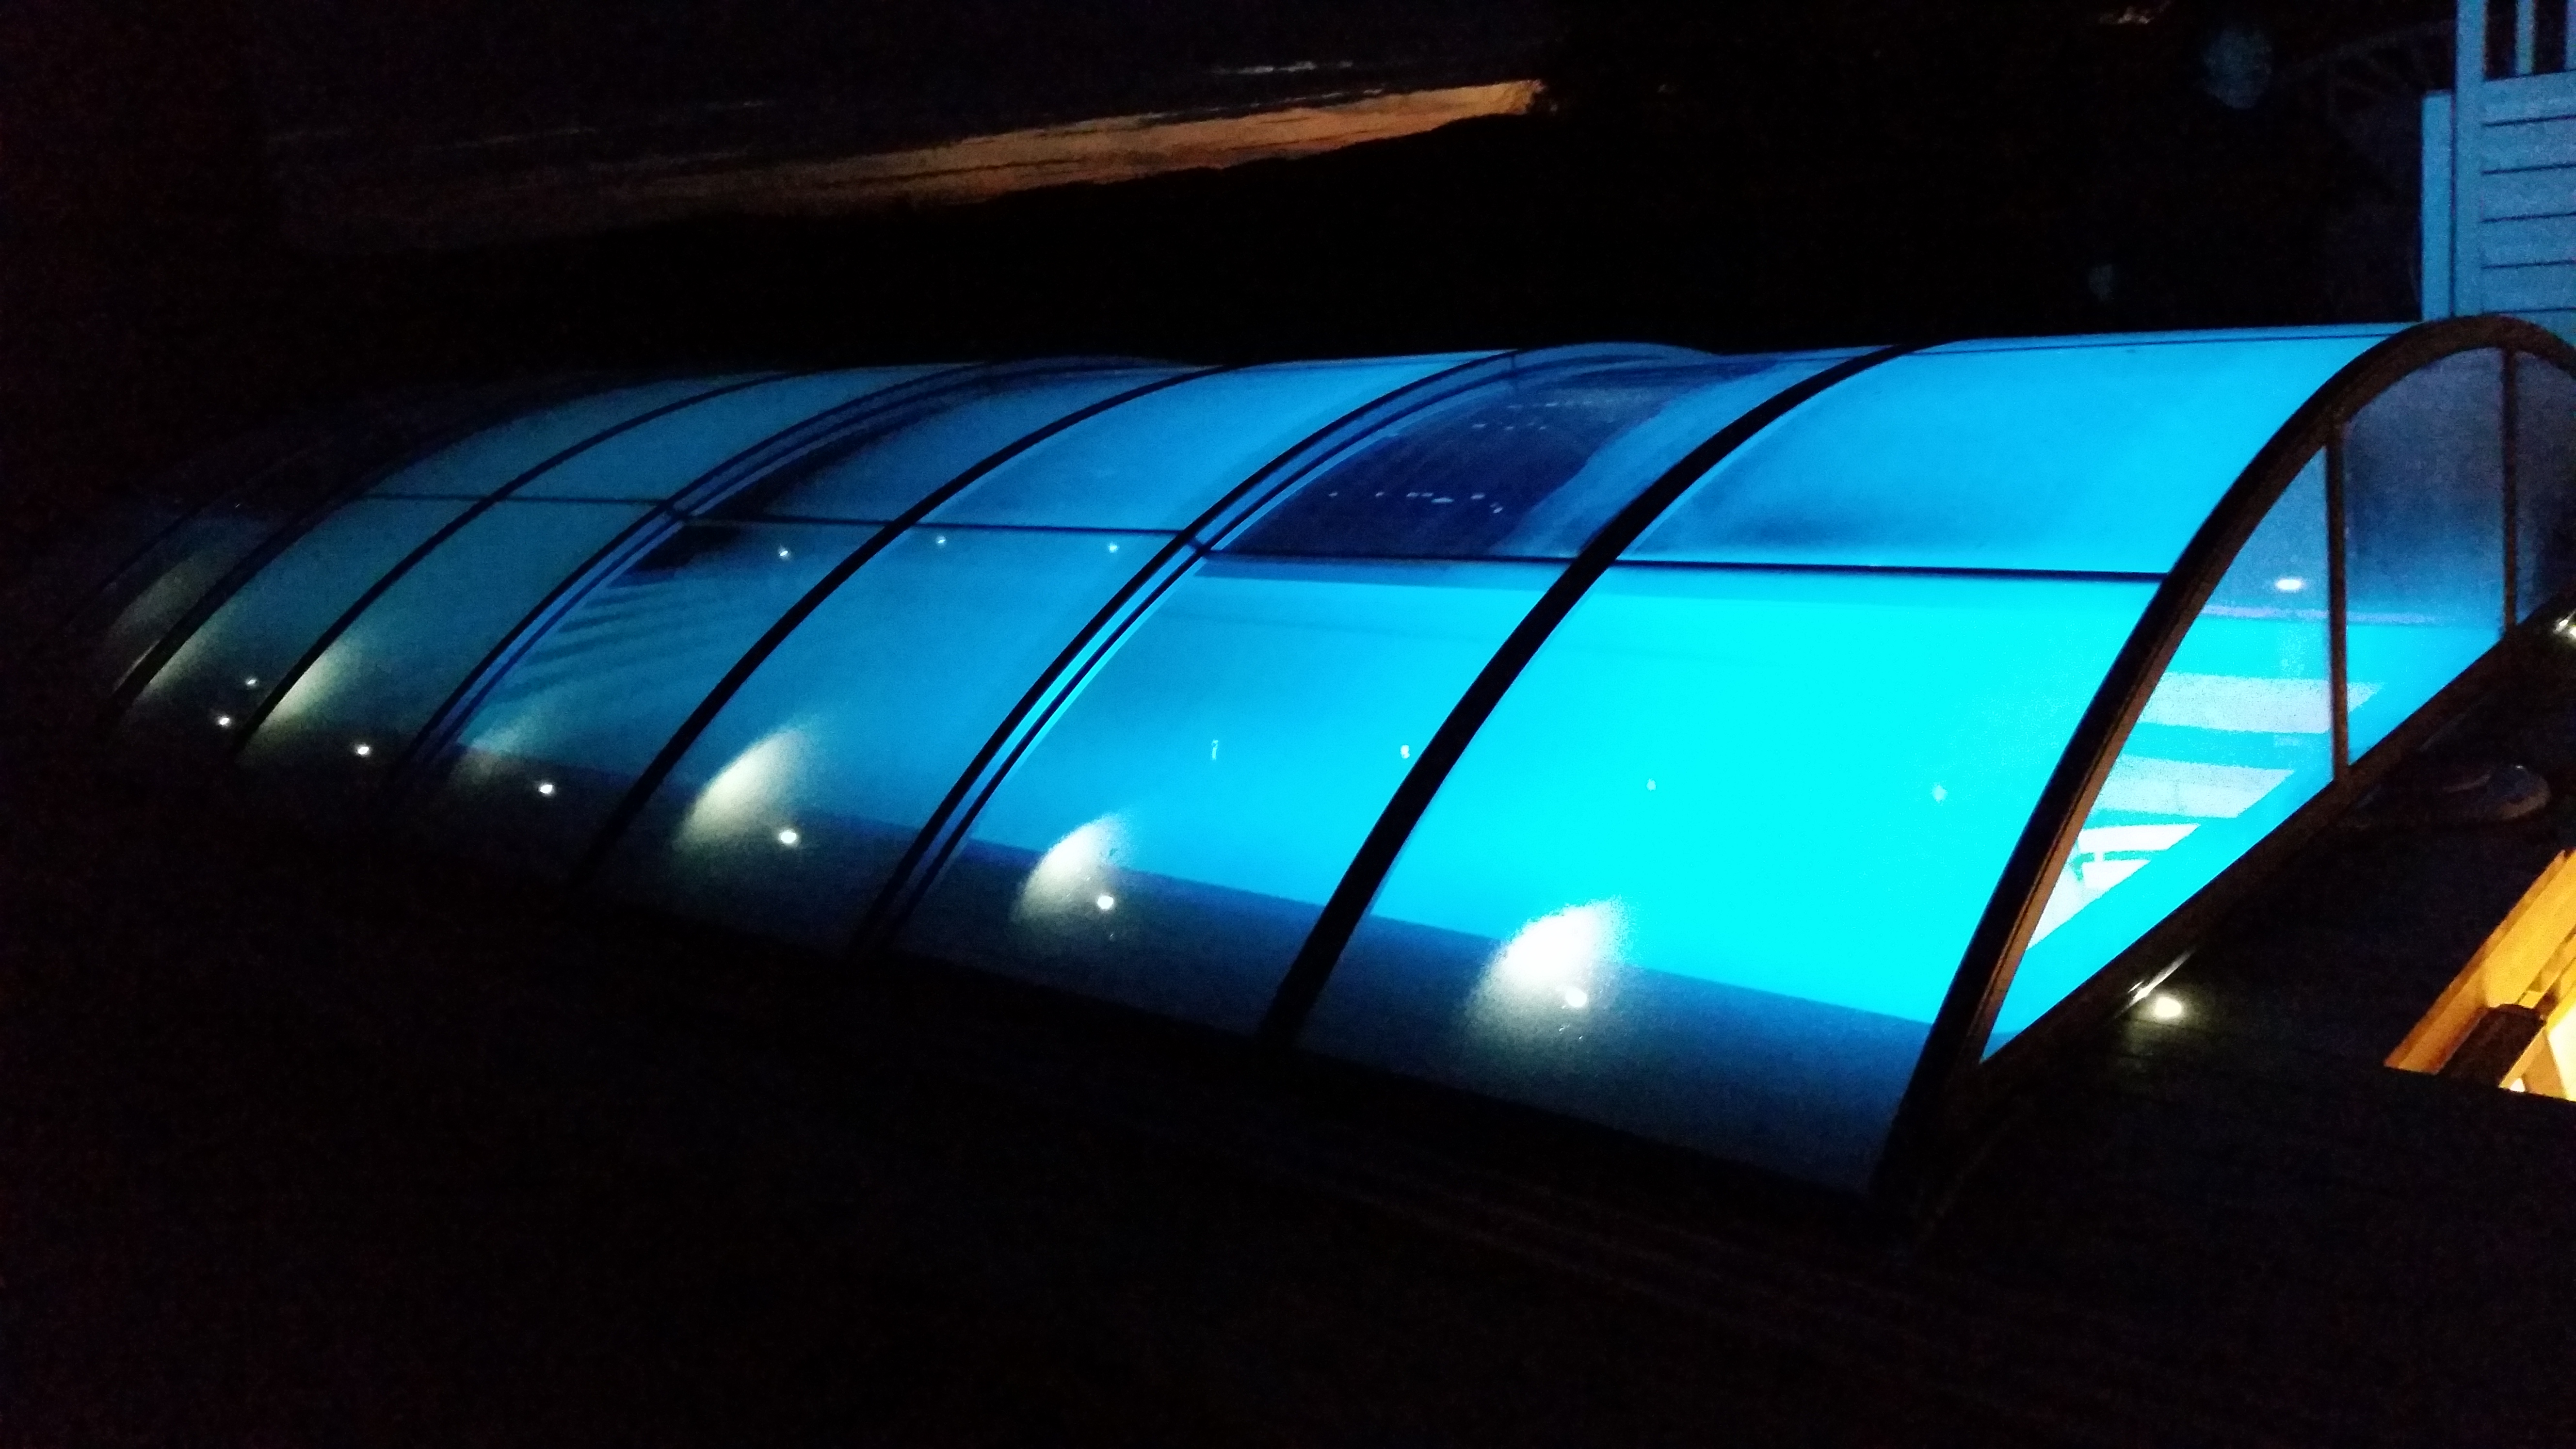 Basseng med overbygg i lyseblått lys